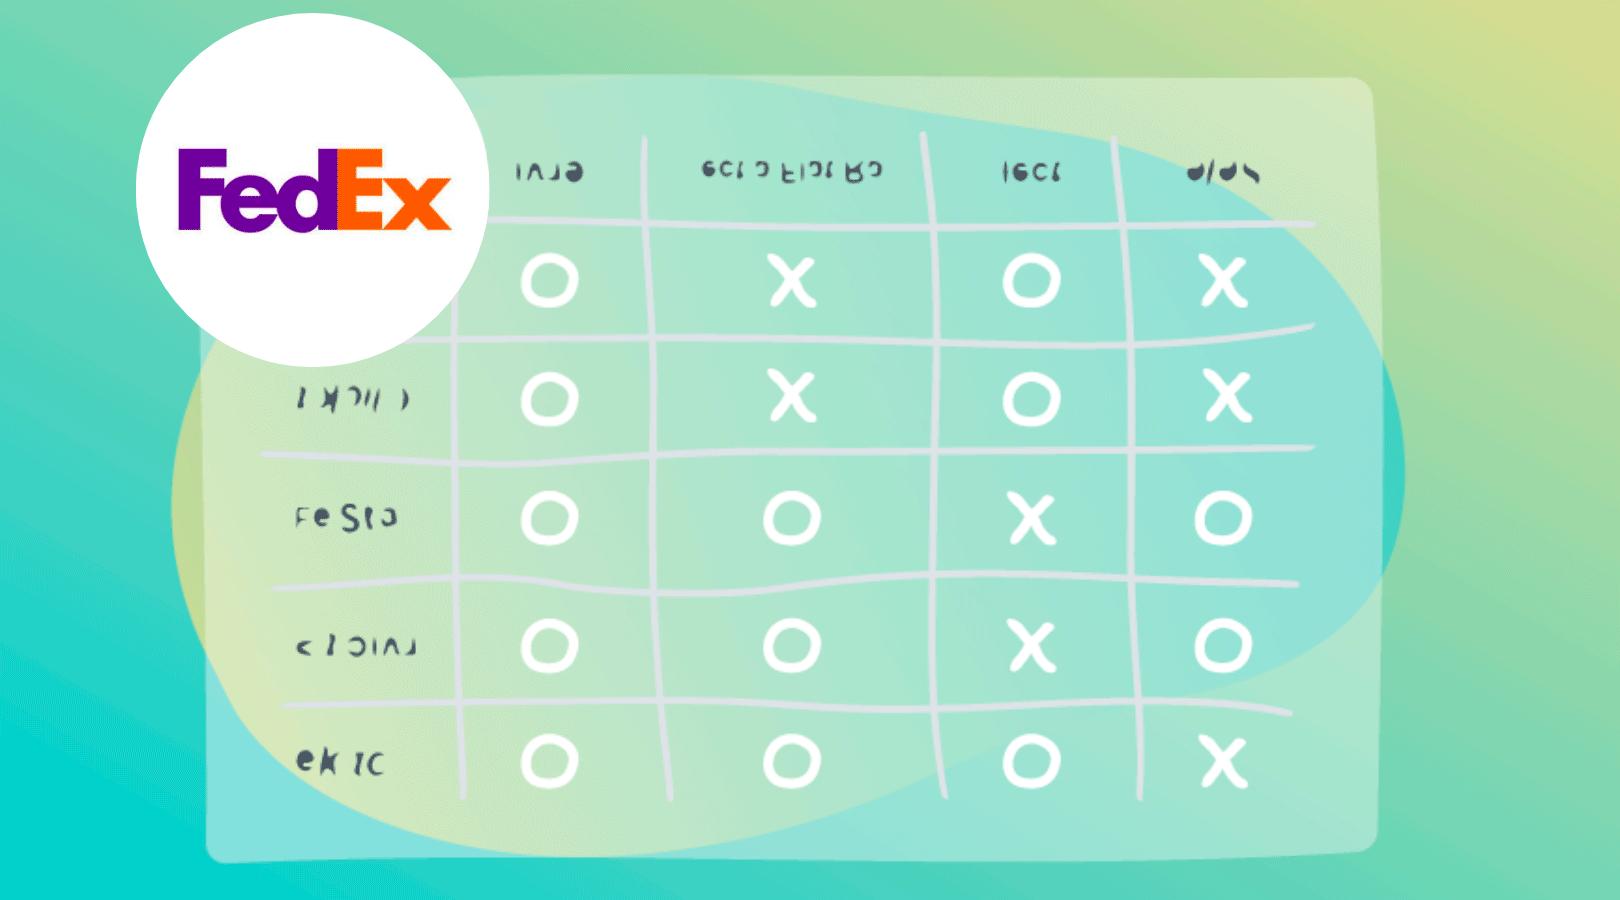 FedEx Locations & Services